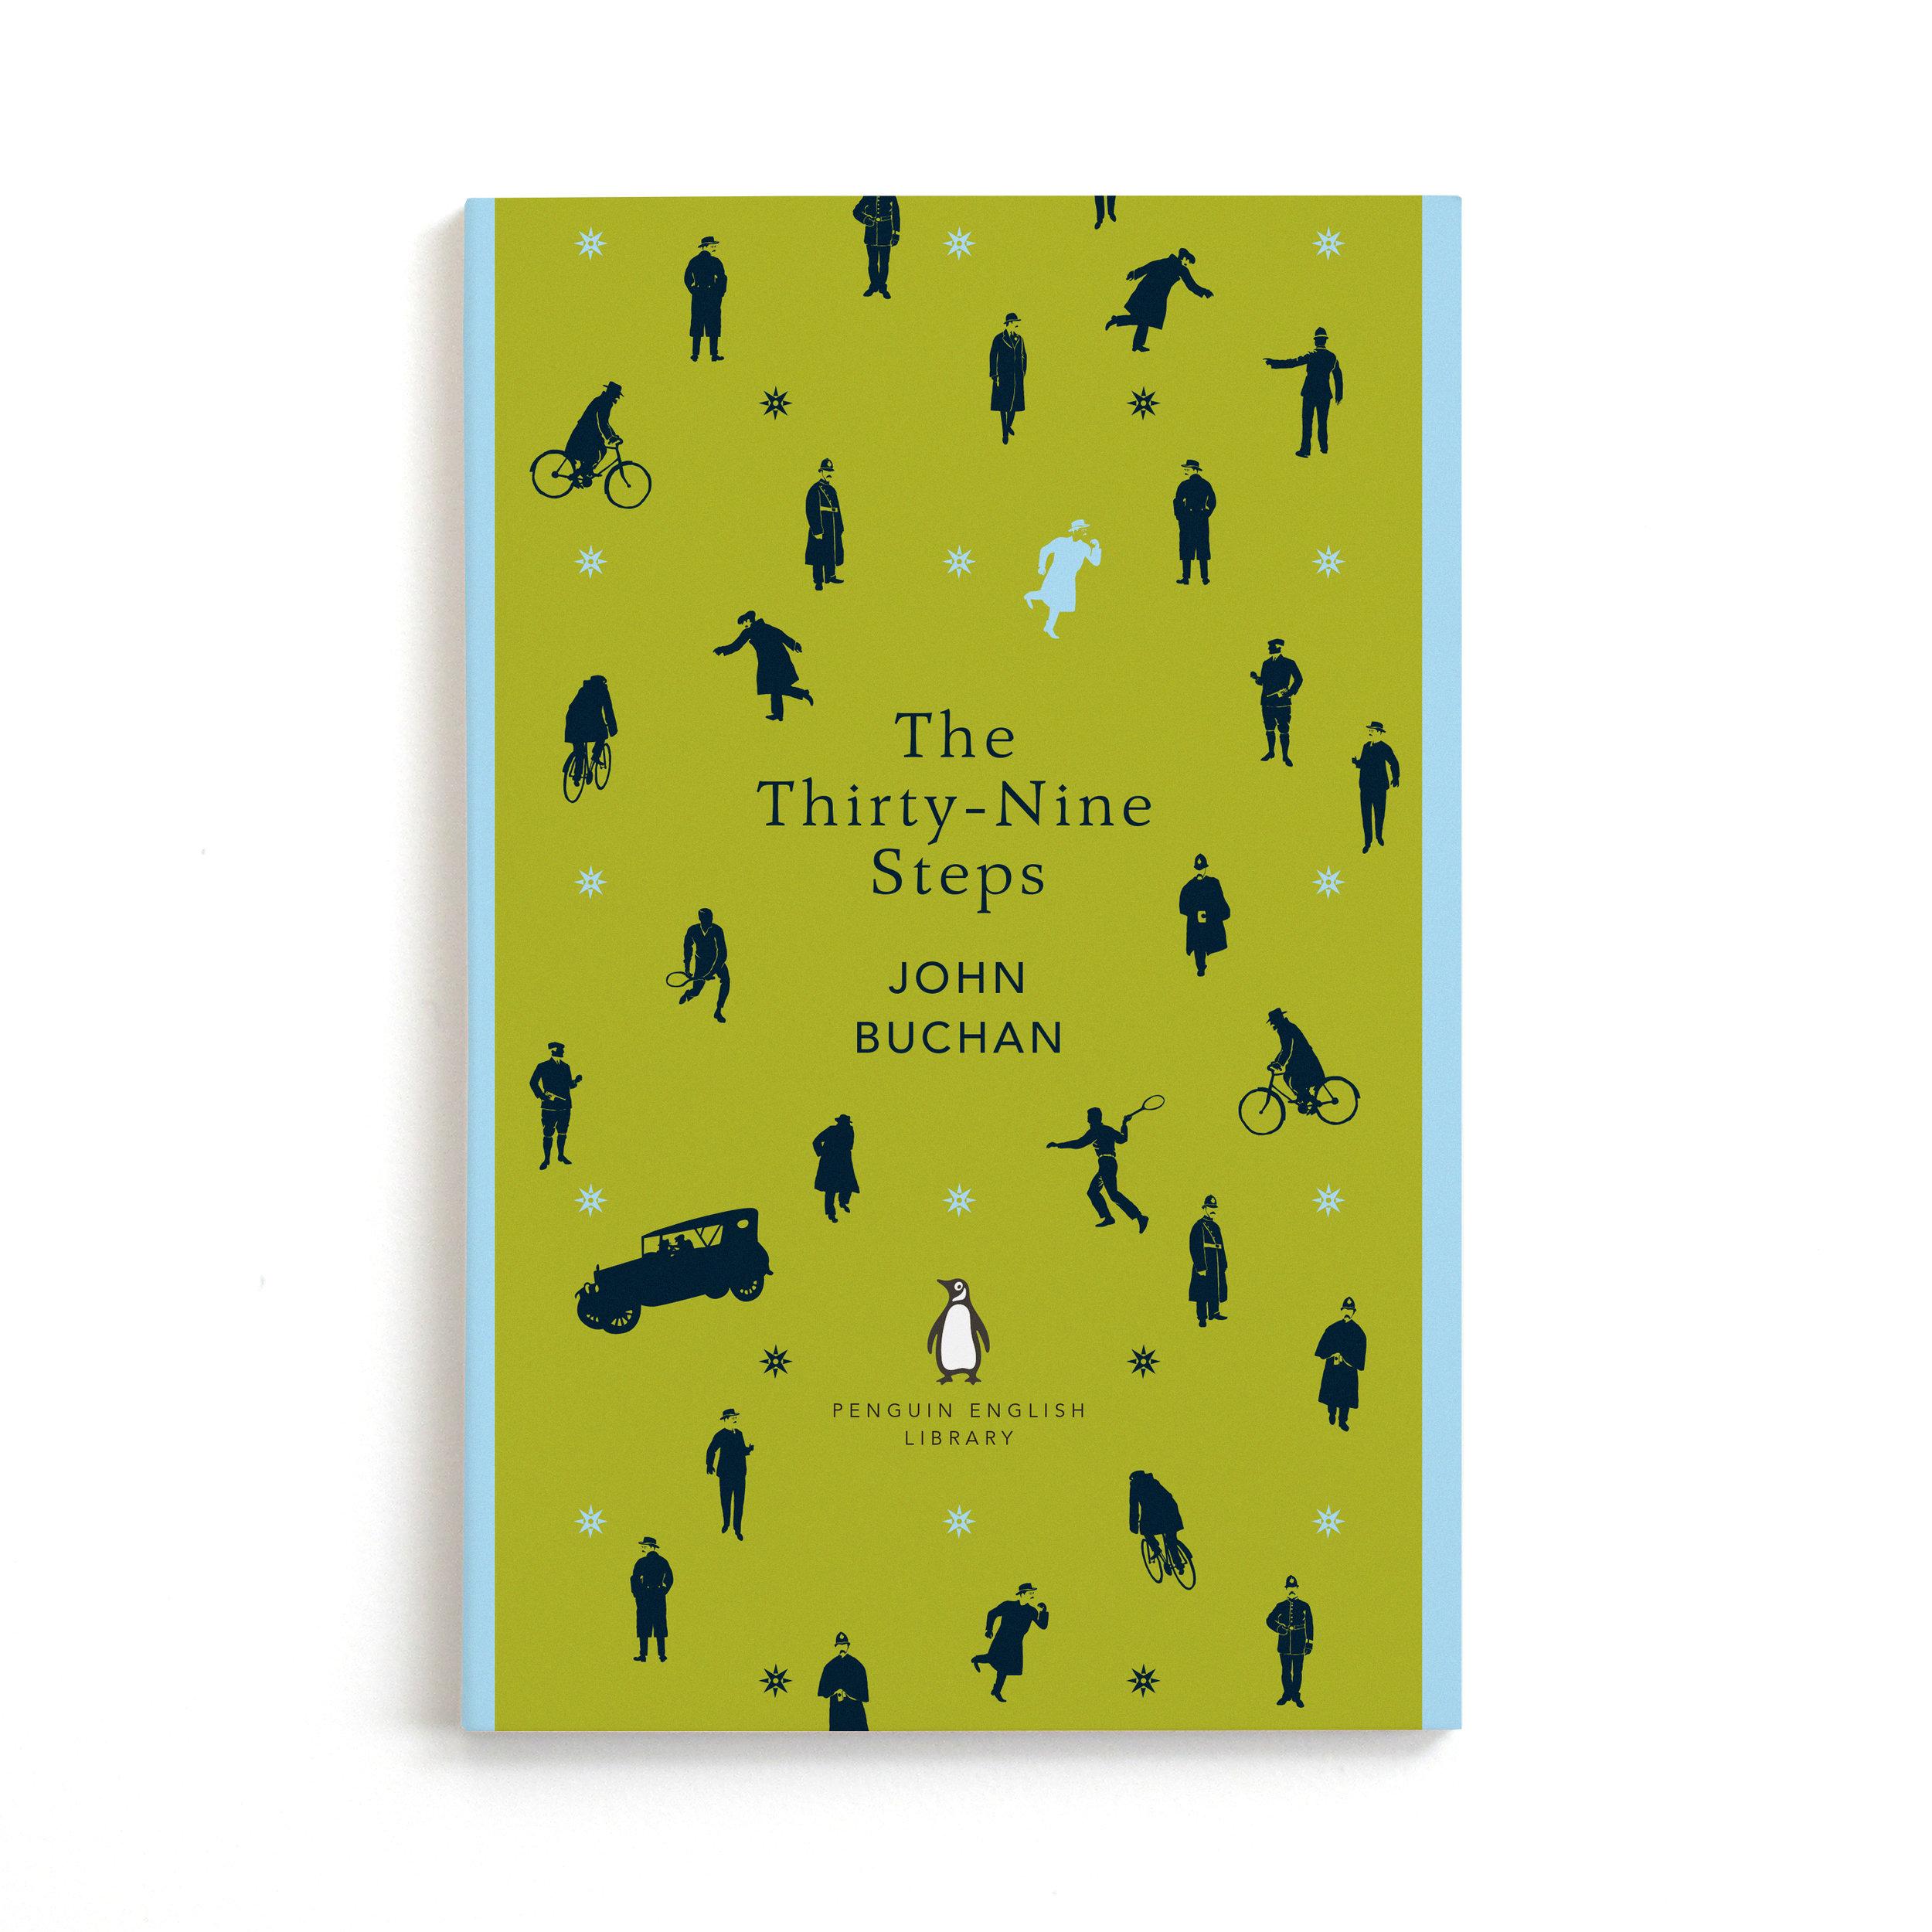 penguin english library david mackintosh